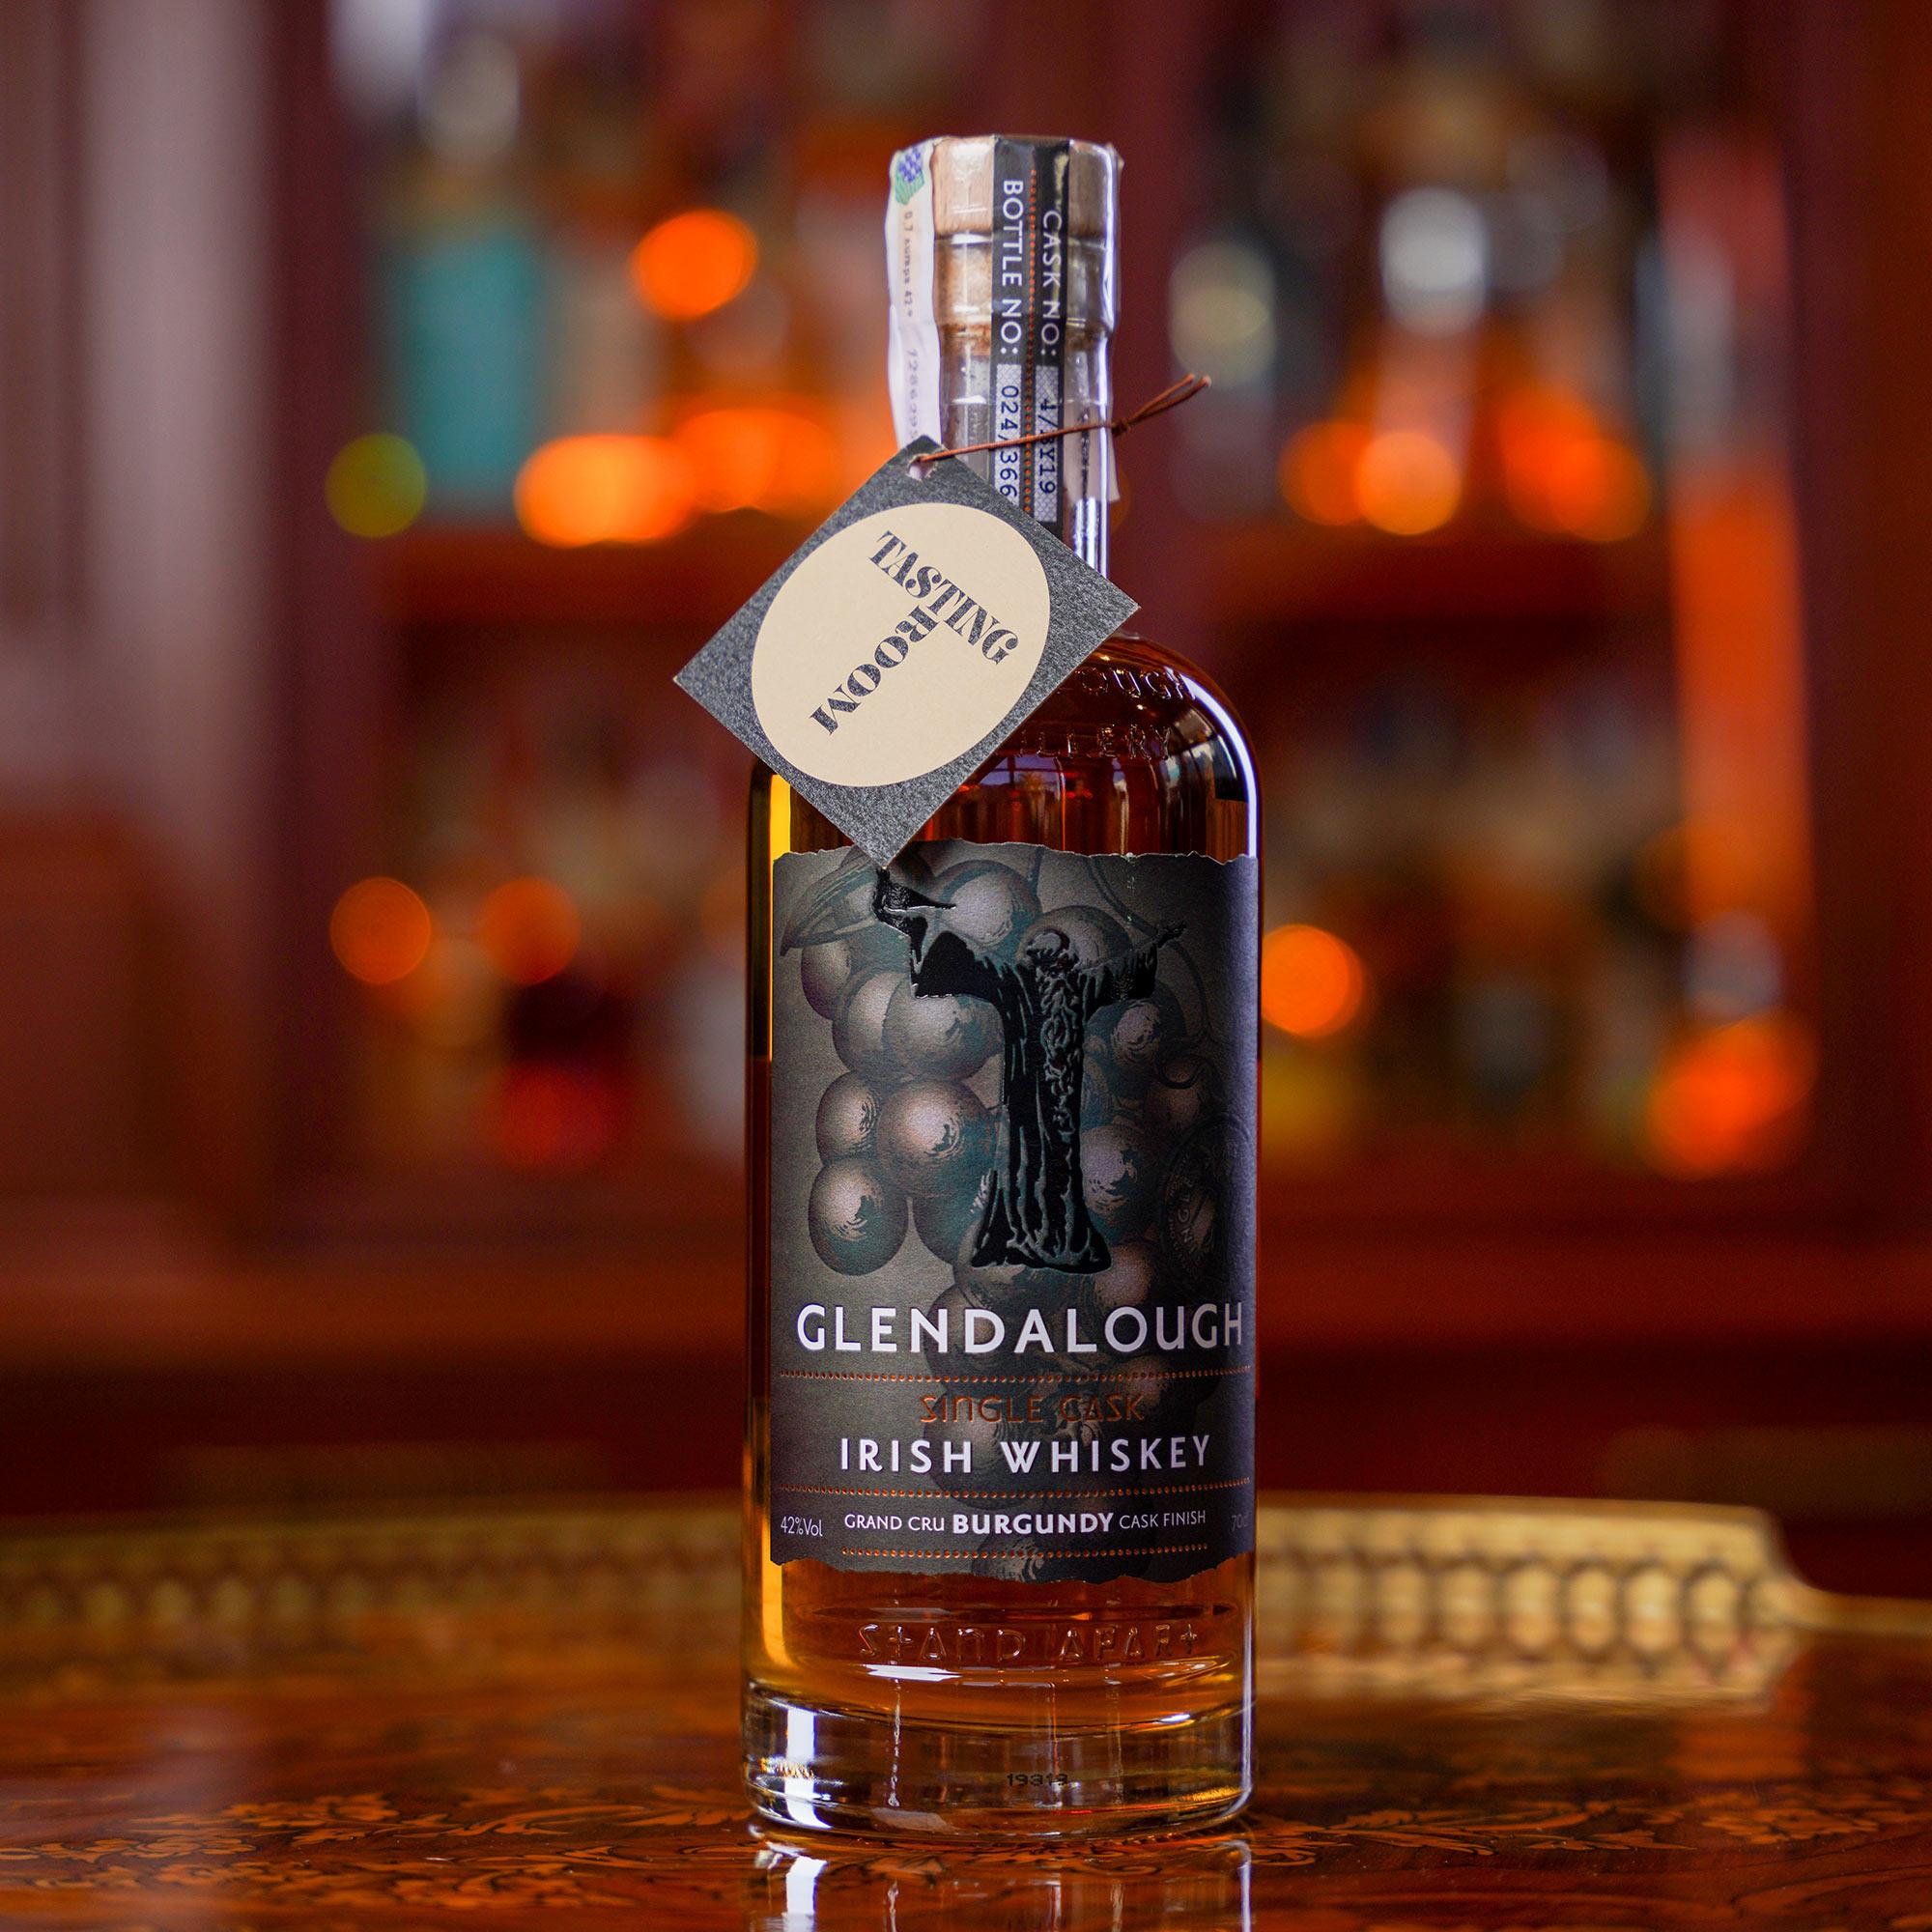 Glendalough Single Cask Burgundy /Глендалок Сингъл Каск Бургунди